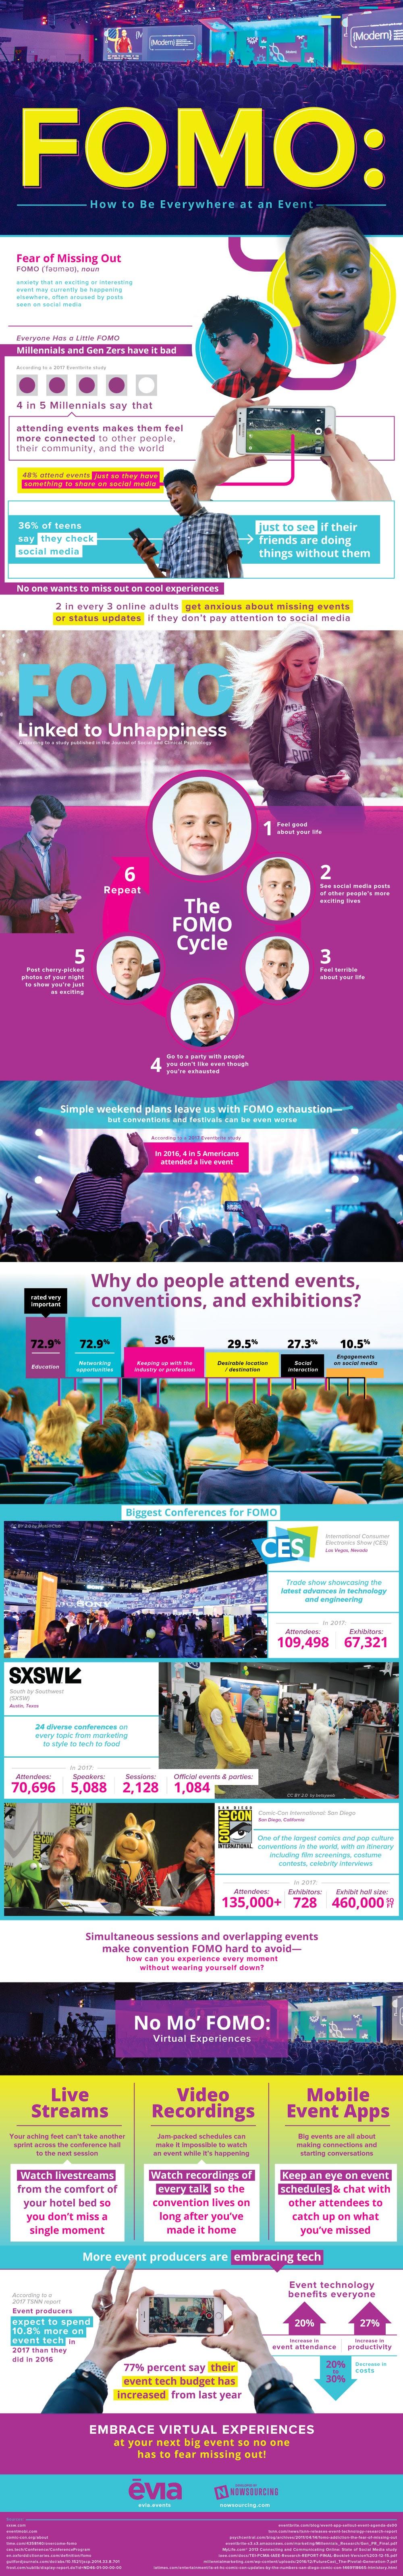 FOMO: Como sacar el máximo provecho a un evento al que asistes en vivo